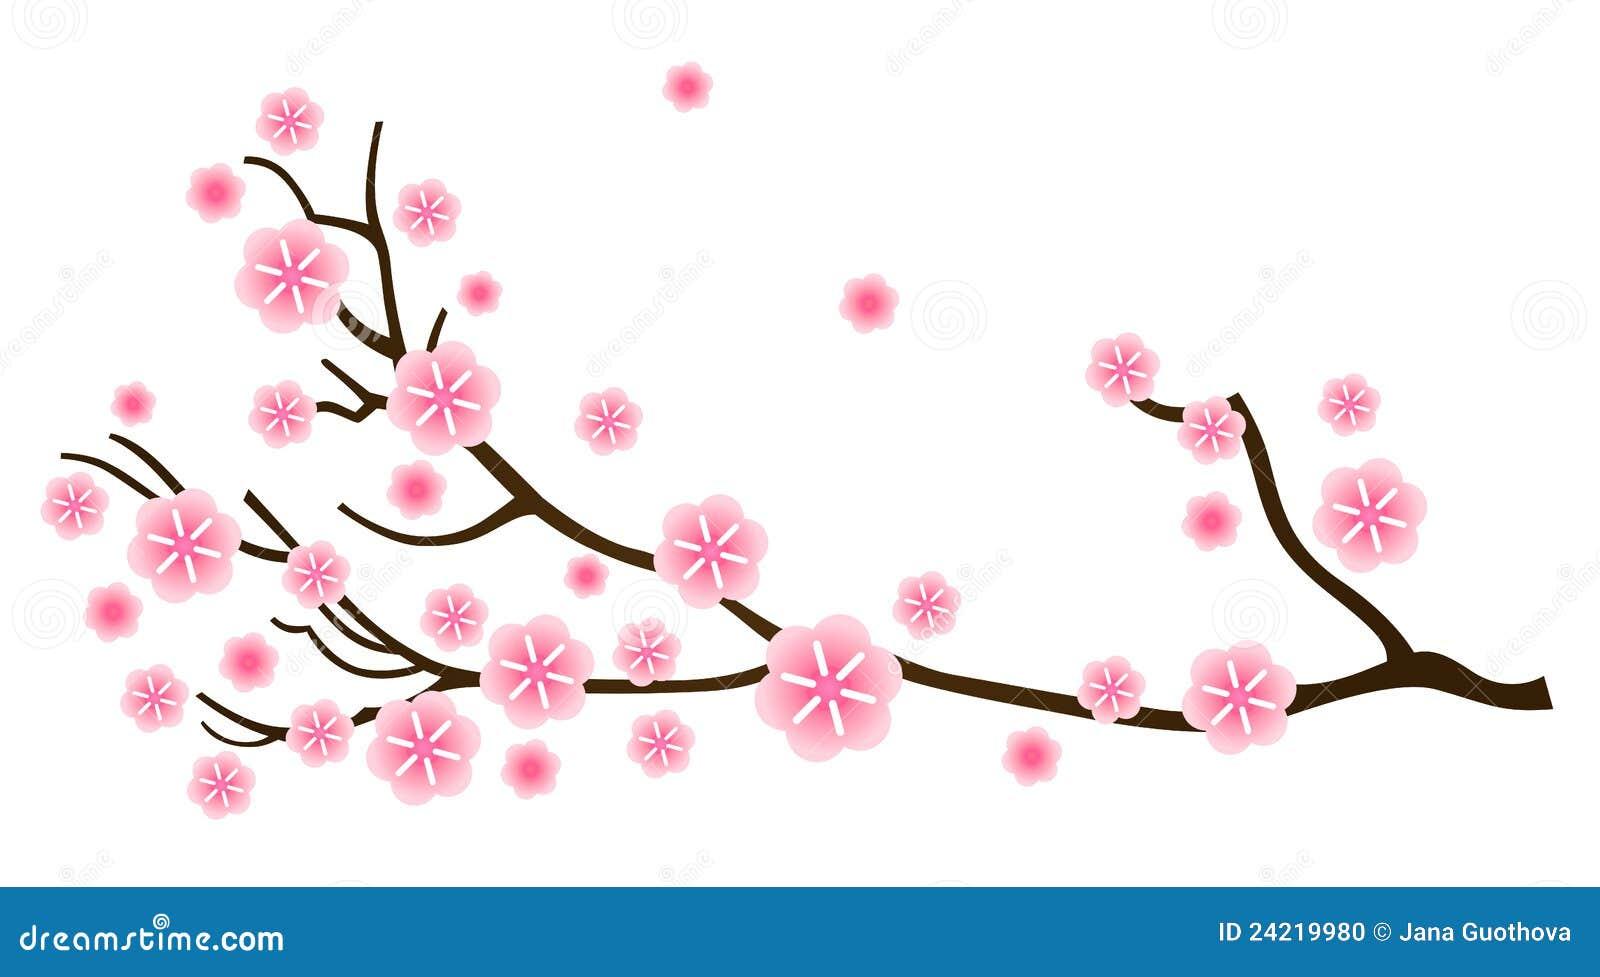 spring branch hispanic single men Hispanic women entrepreneurs https: men and women 35yrs and up ne sa born again single meetup bulverde/spring branch networking meetup.